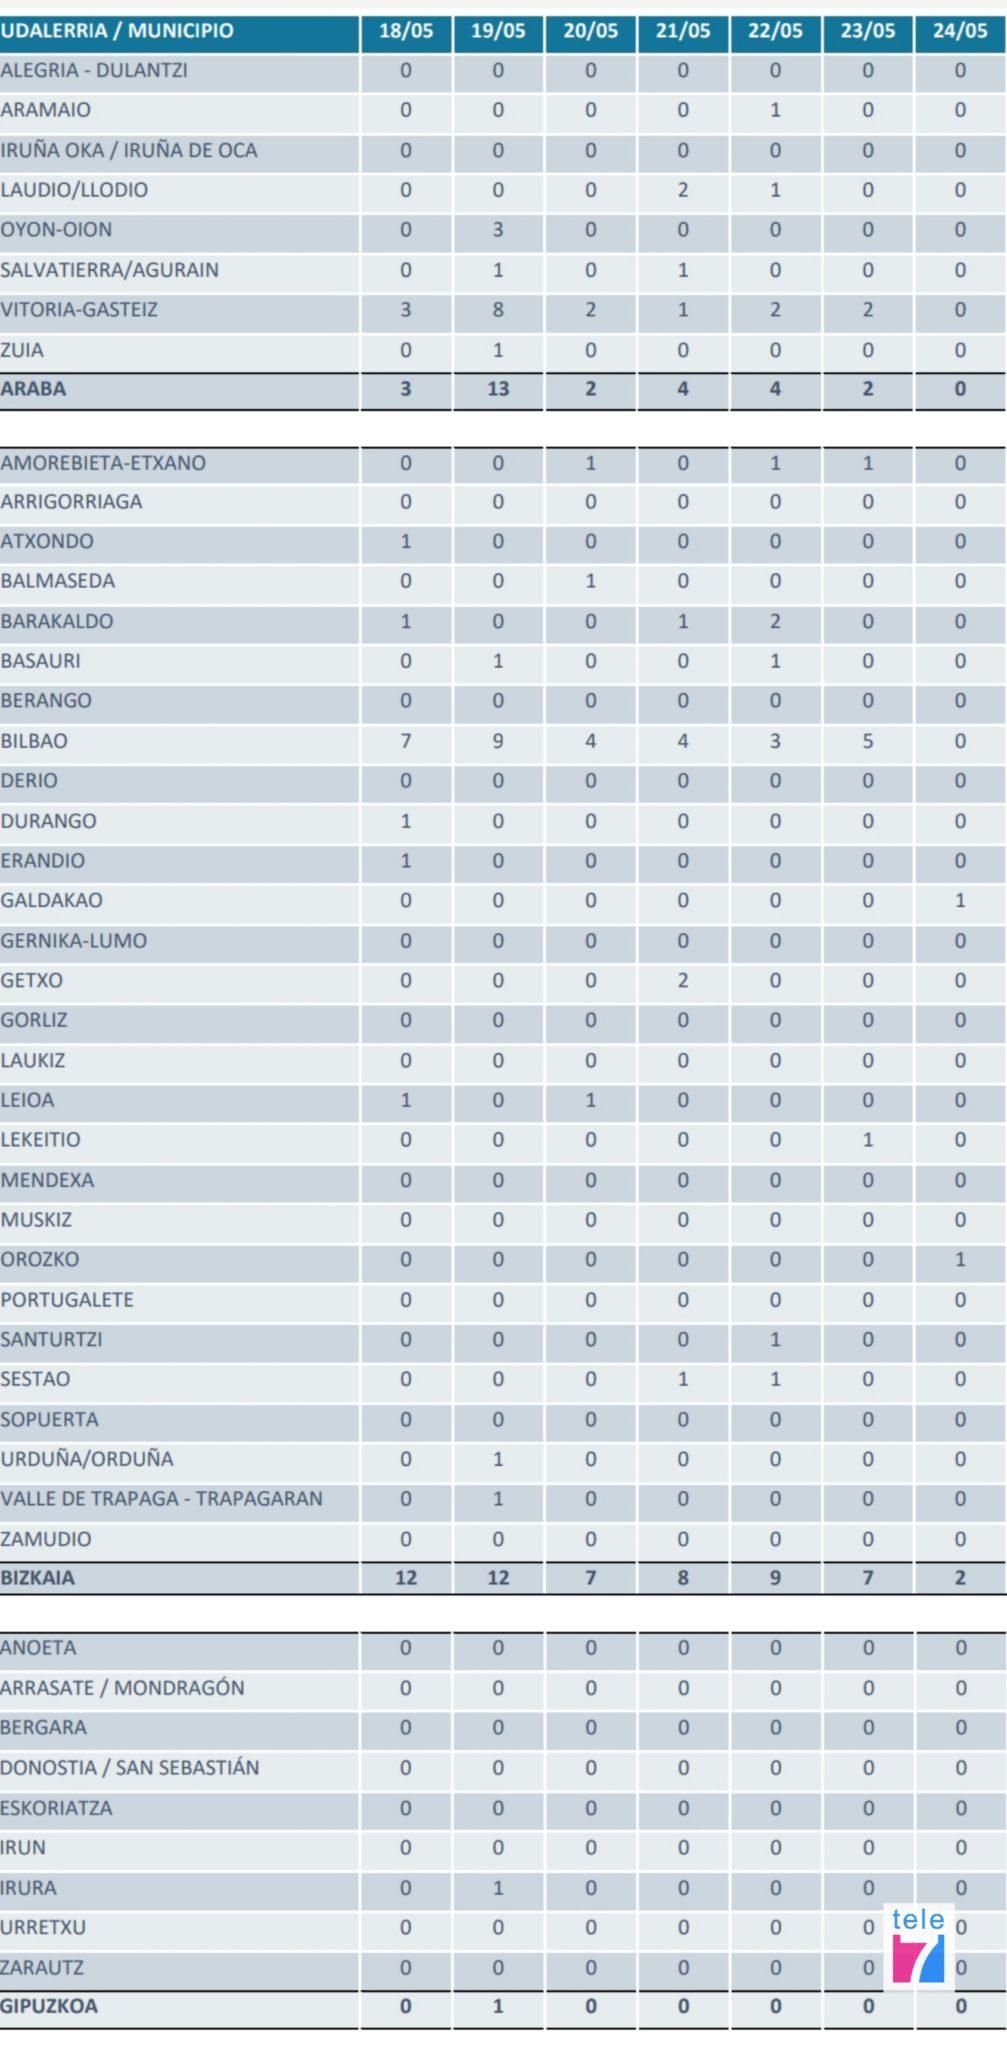 Datos covid19 Euskadi 25-05-20